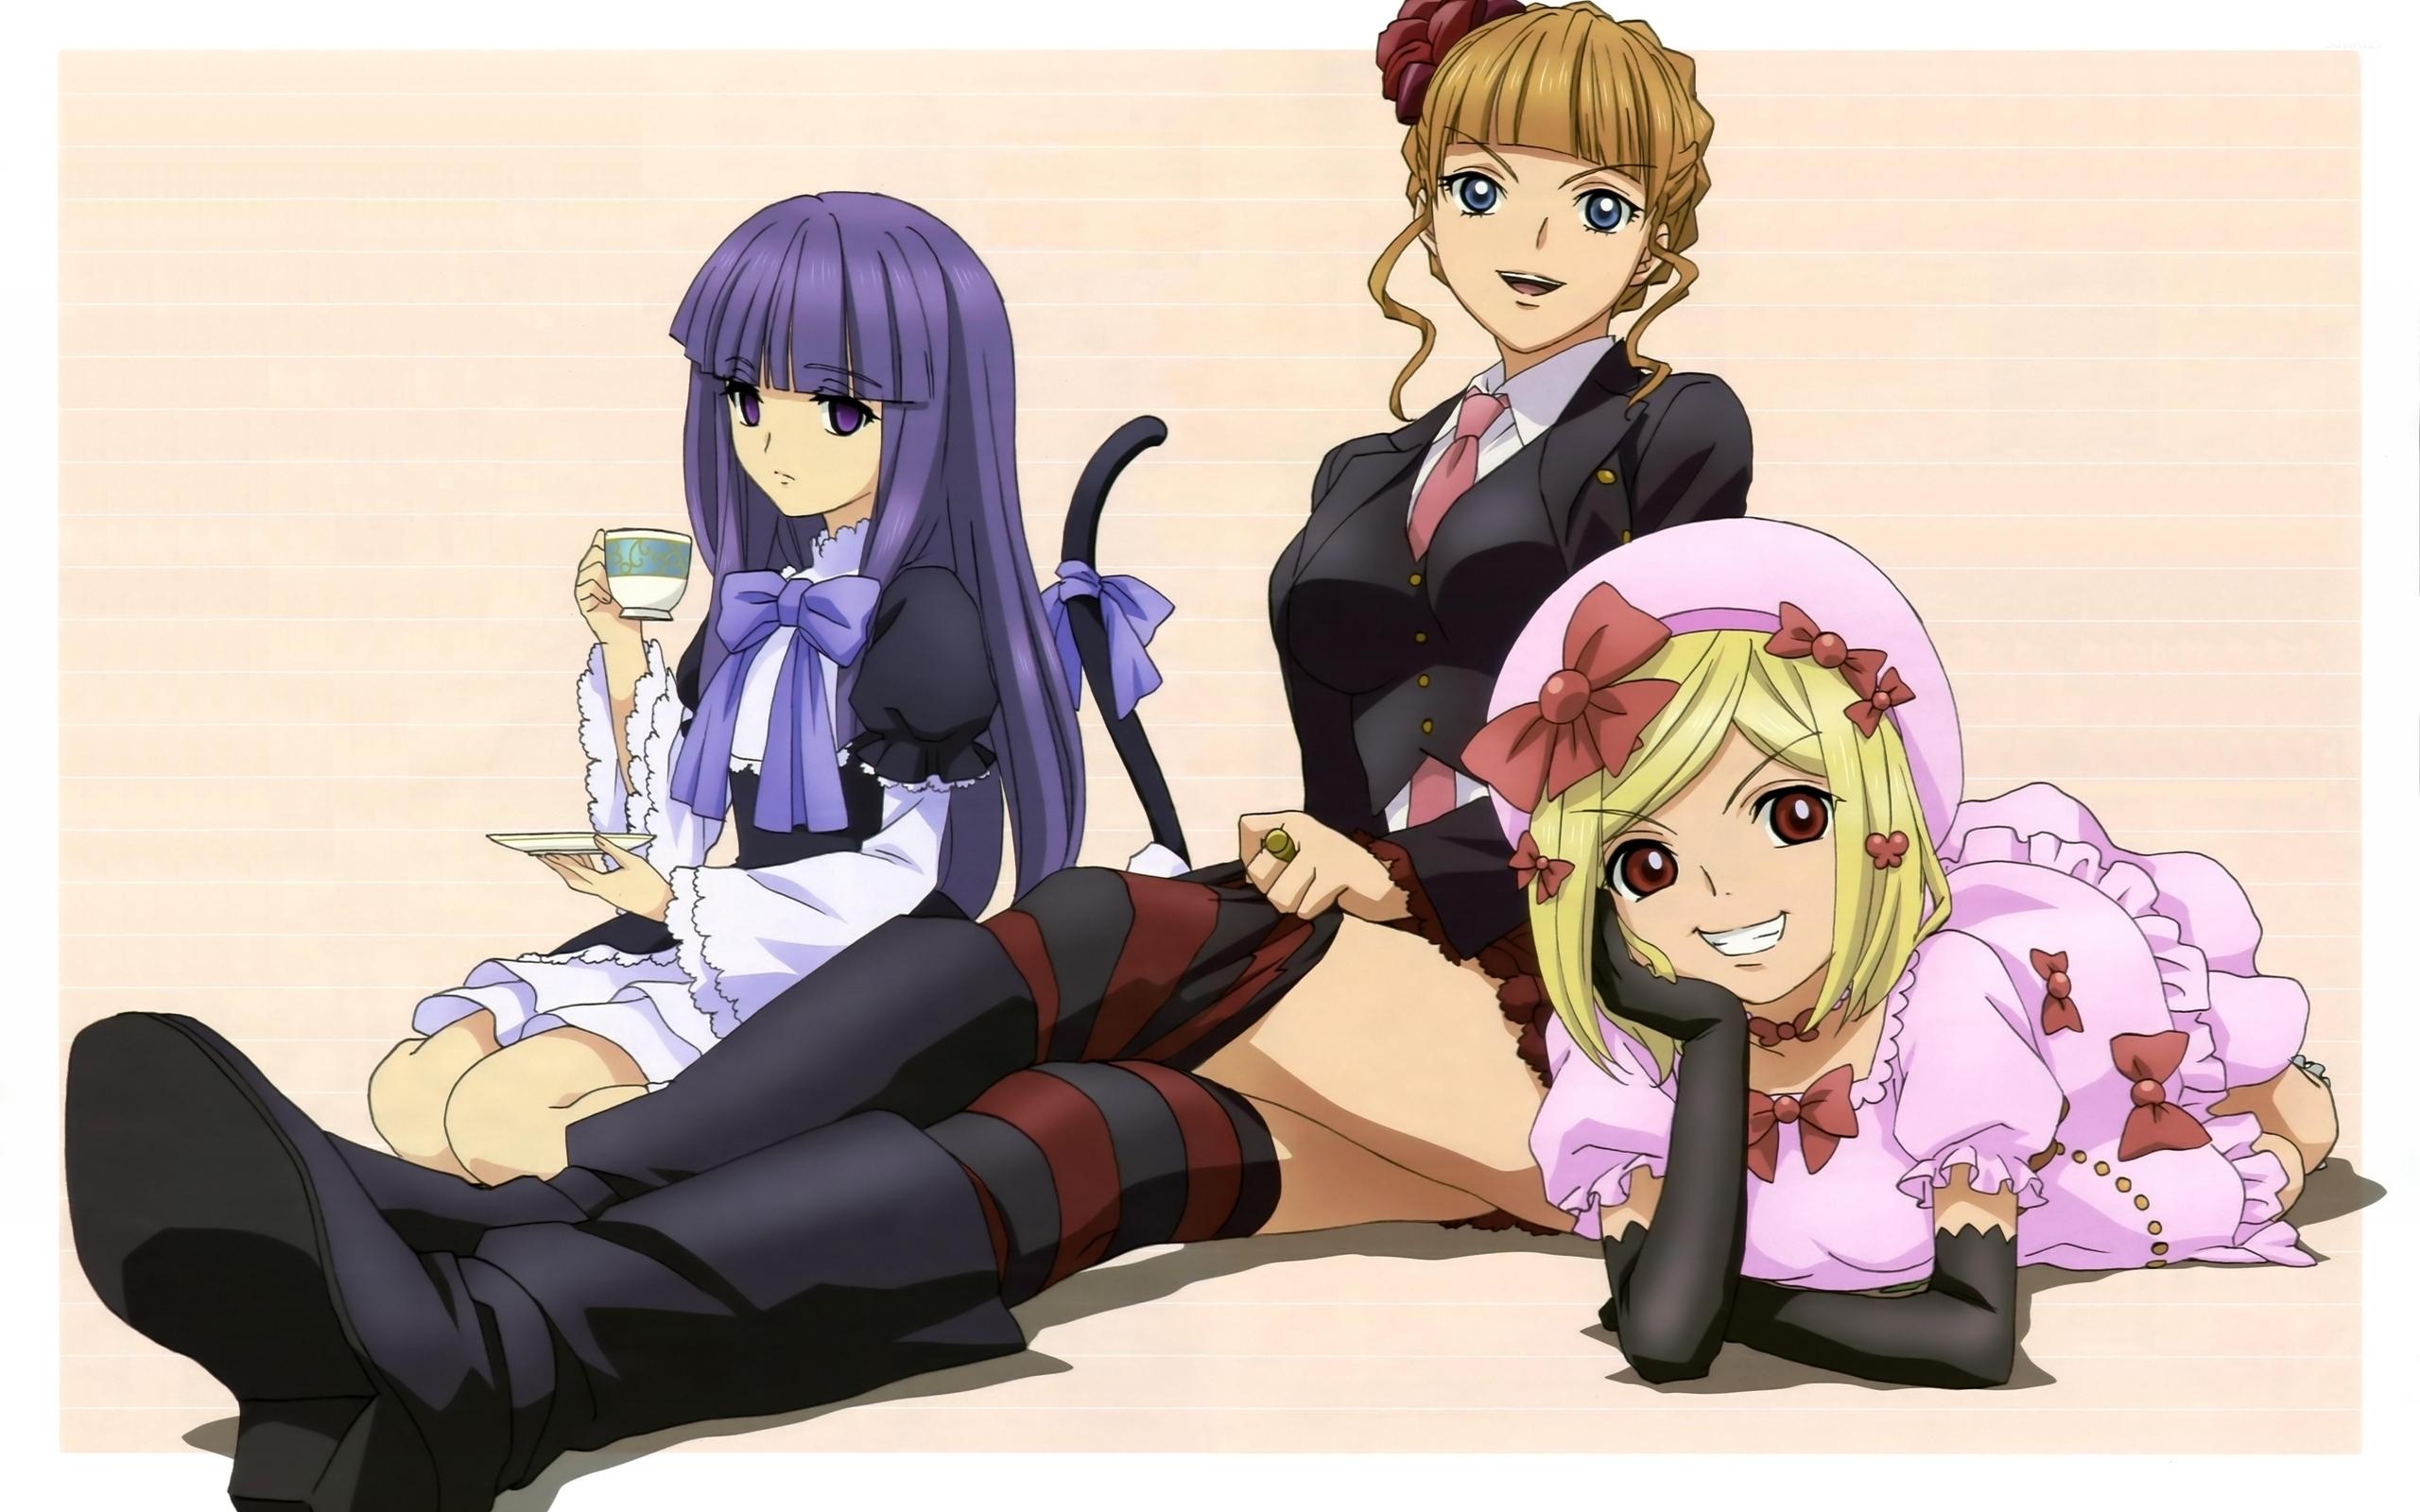 Umineko No Naku Koro Ni Wallpaper Anime Wallpapers 8995